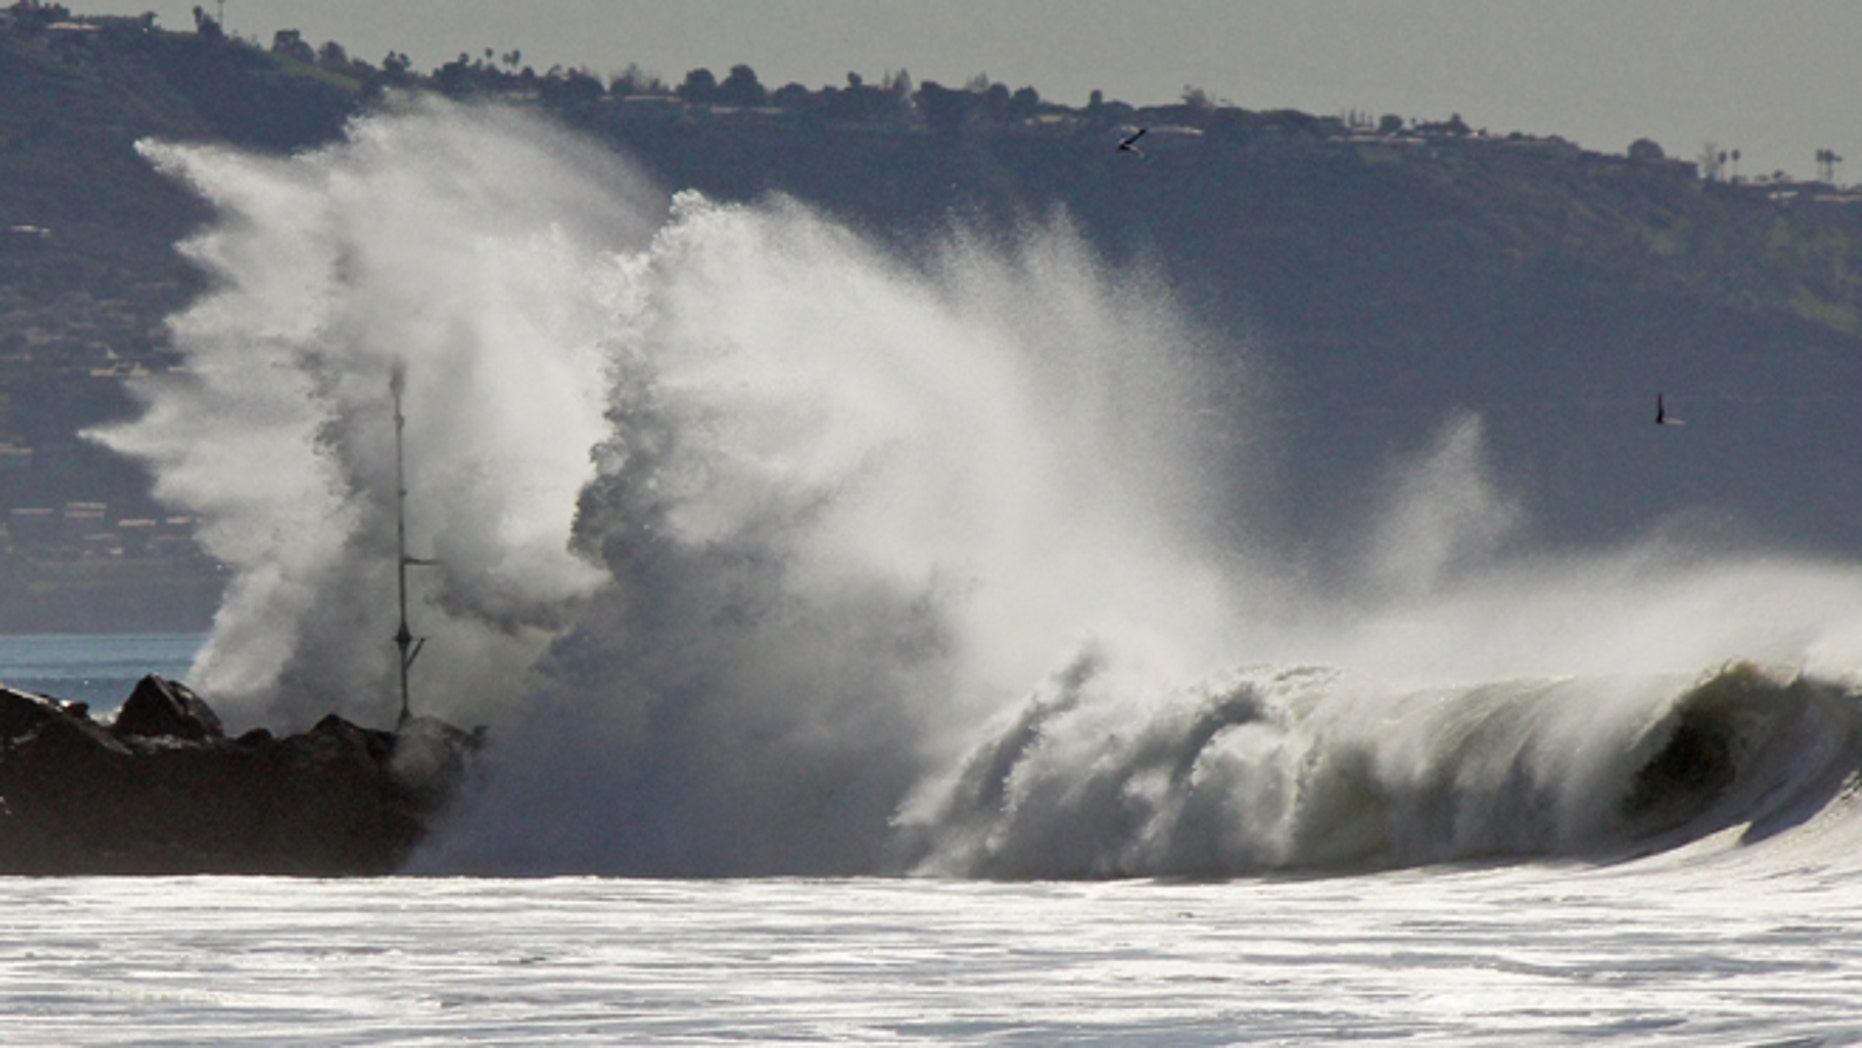 Jan. 24, 2015: Huge surf crashes over a jetty at El Segundo, Calif. (AP)